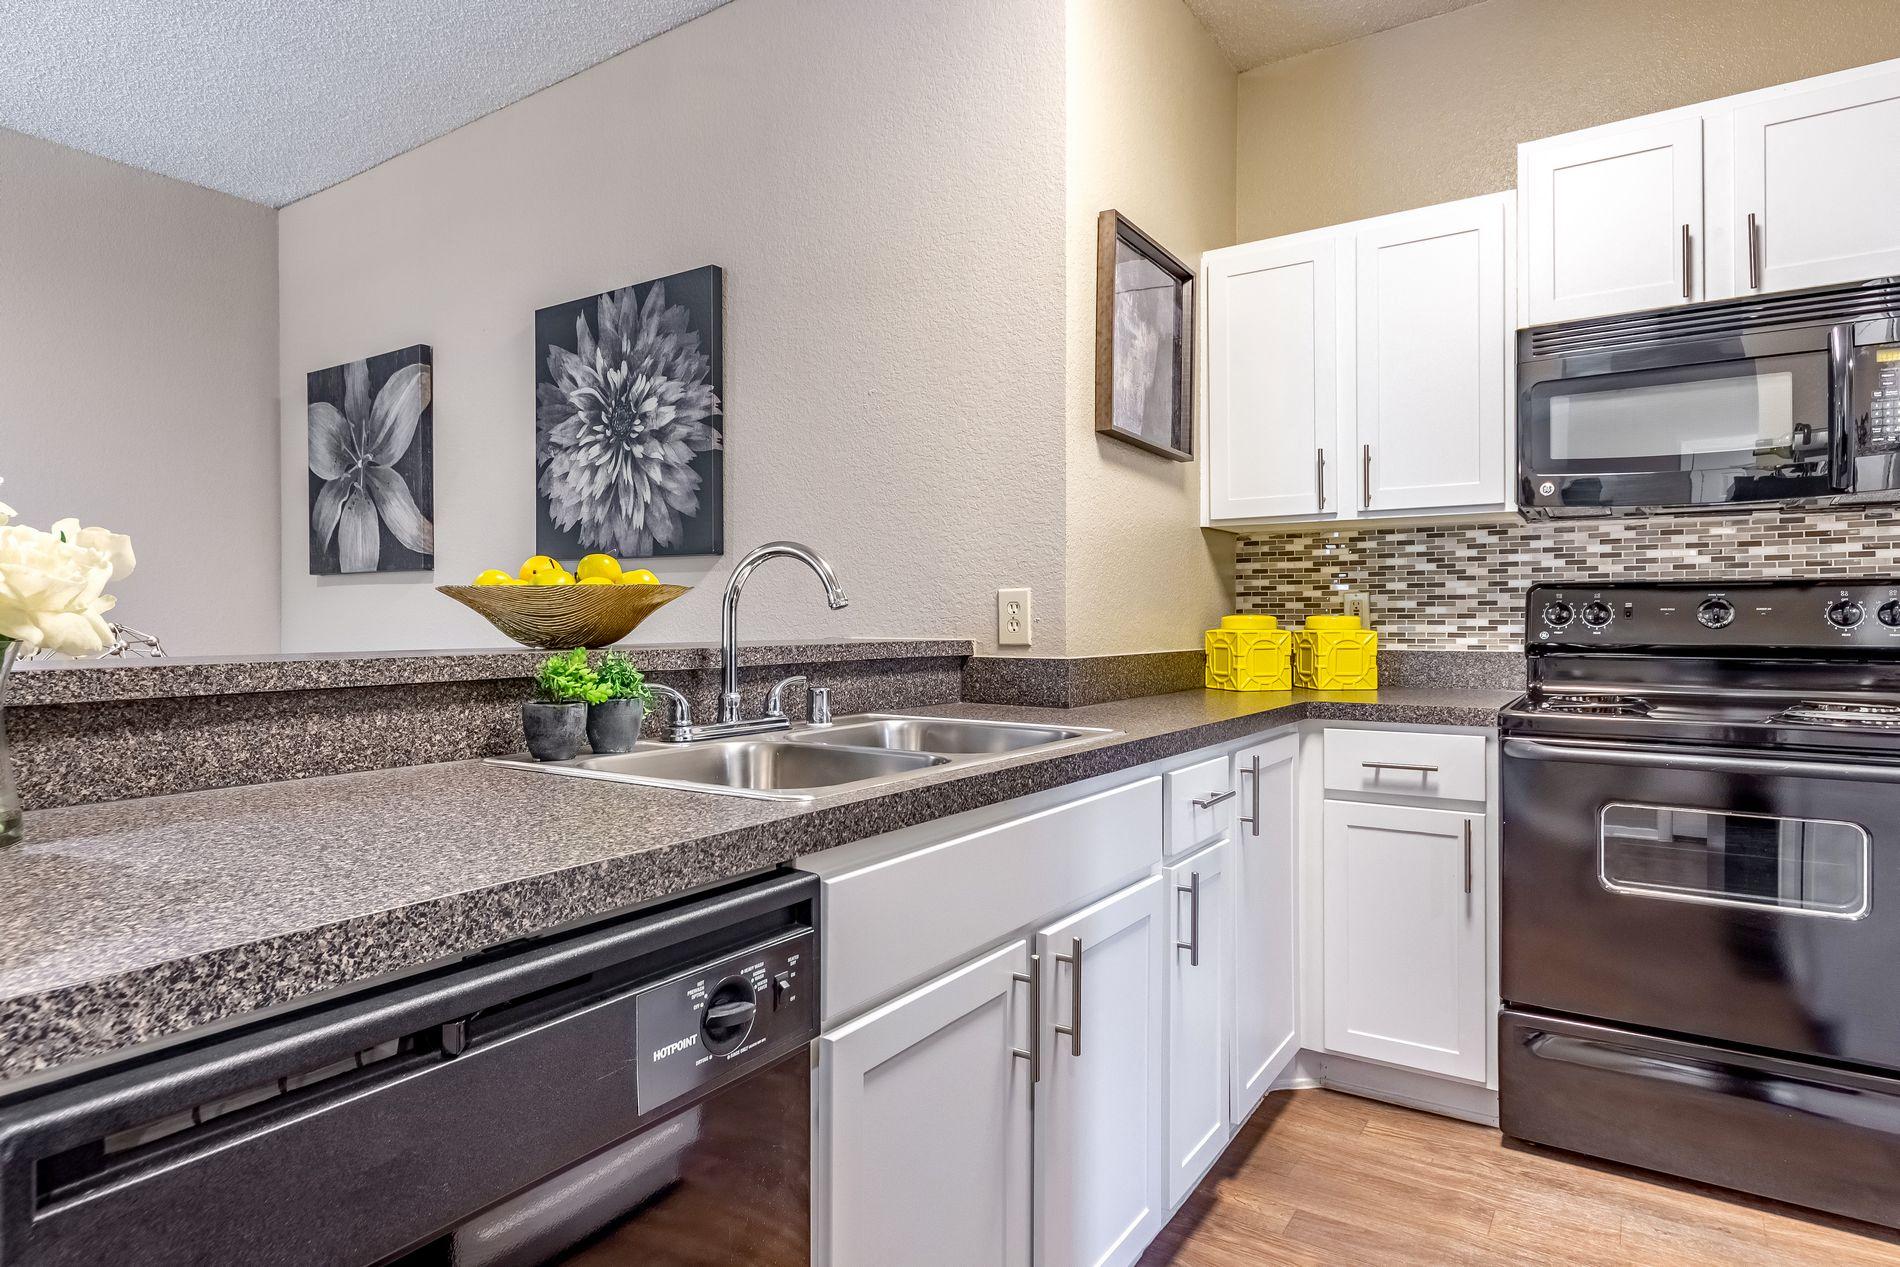 Model Kitchen at La Costa Apartments in Plano, Texas, TX